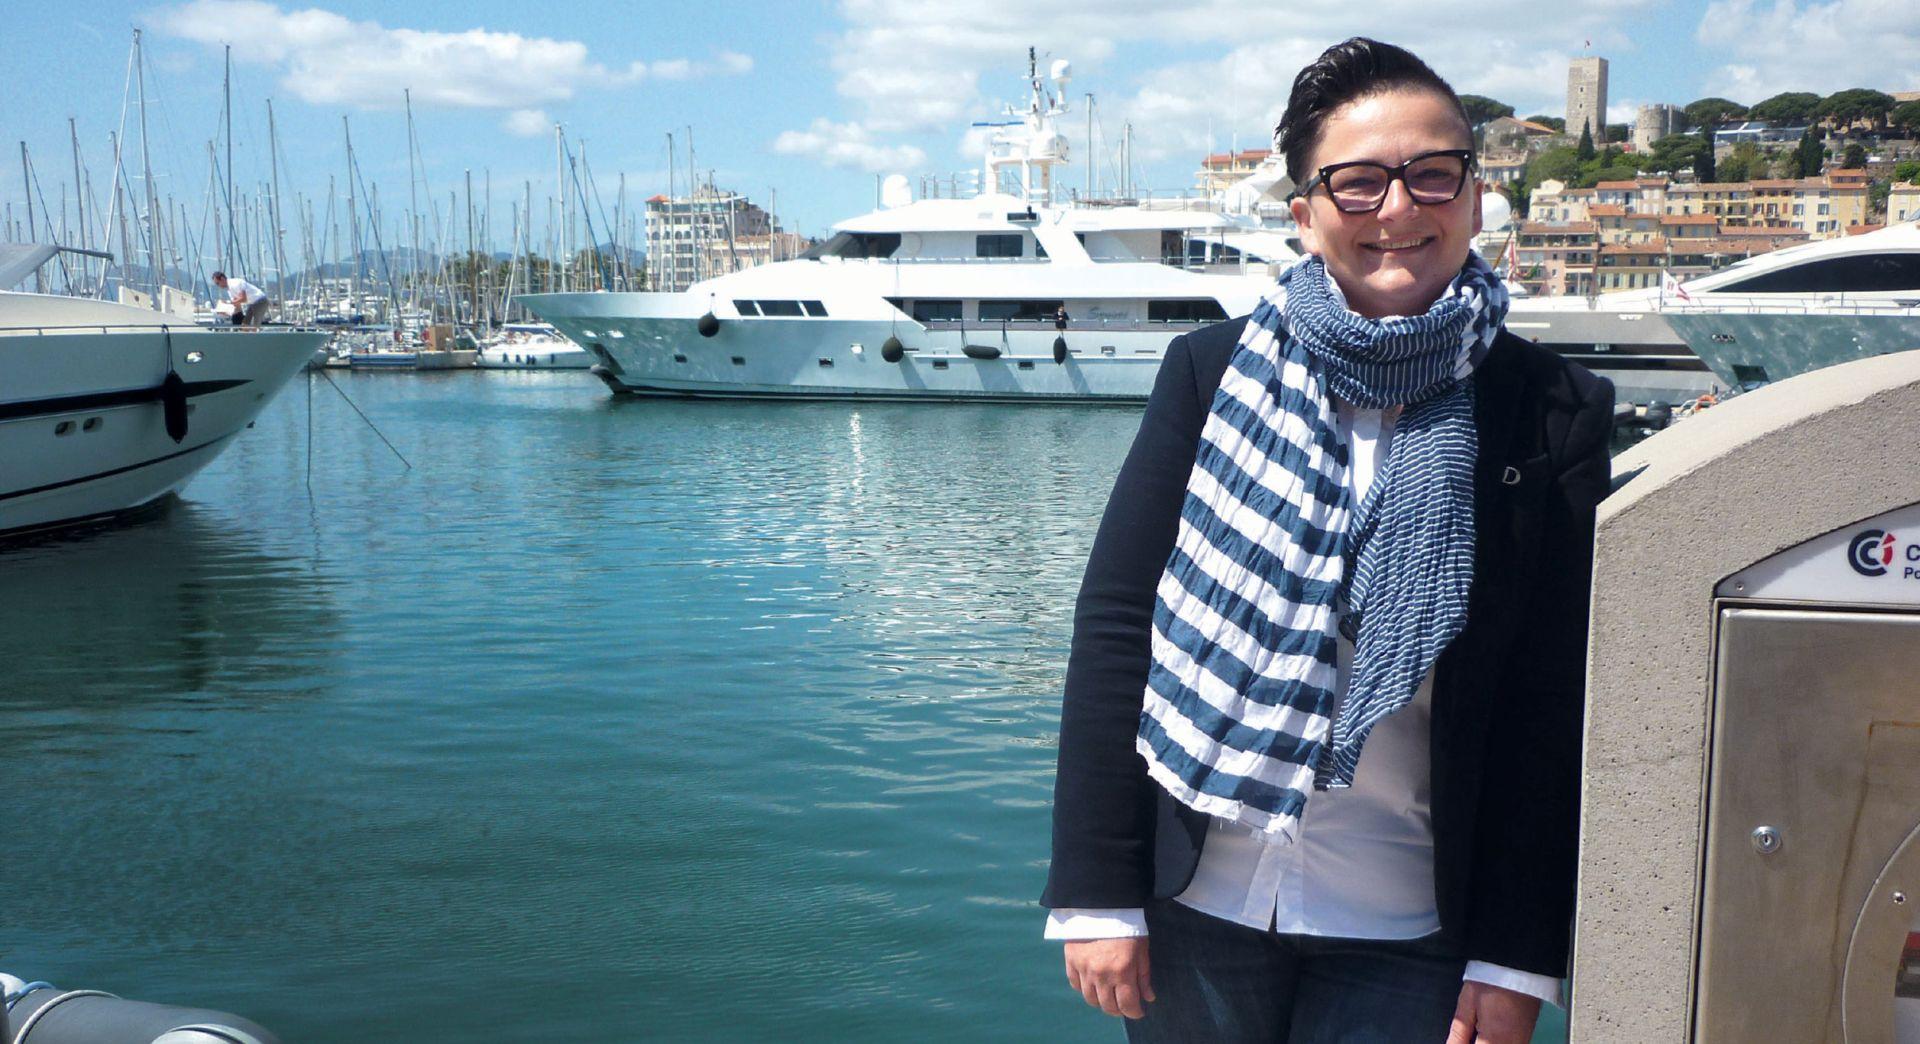 INTERVIEW: ZDENKA GOLD 'Moj uspjeh u Cannesu HAVC-u ne znači mnogo'